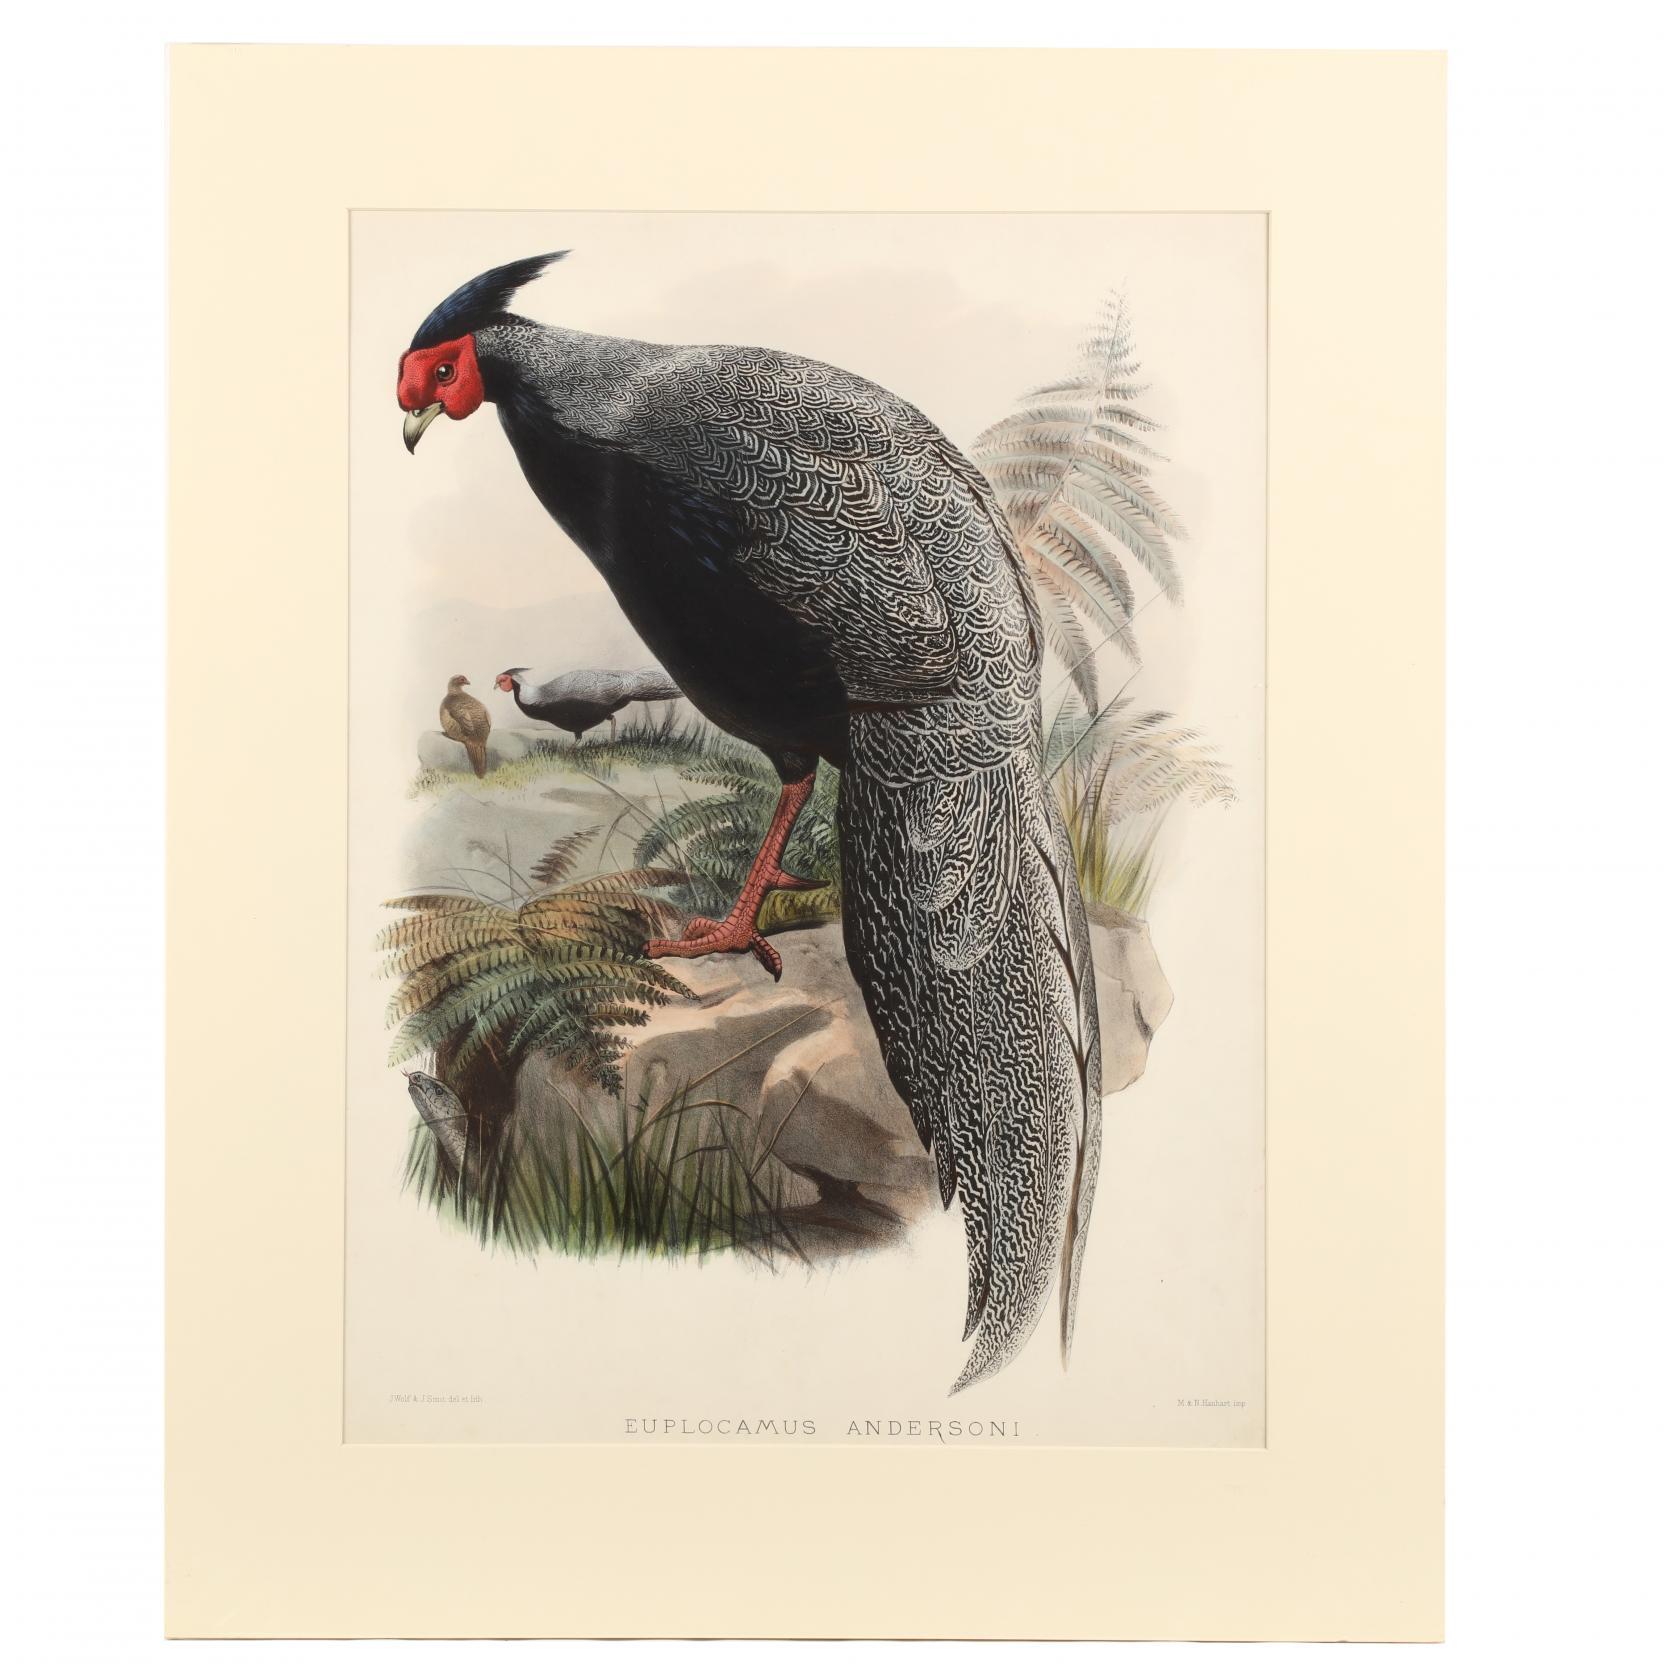 after-joseph-wolf-by-j-smit-19th-century-euplocamus-andersoni-anderson-s-pheasant